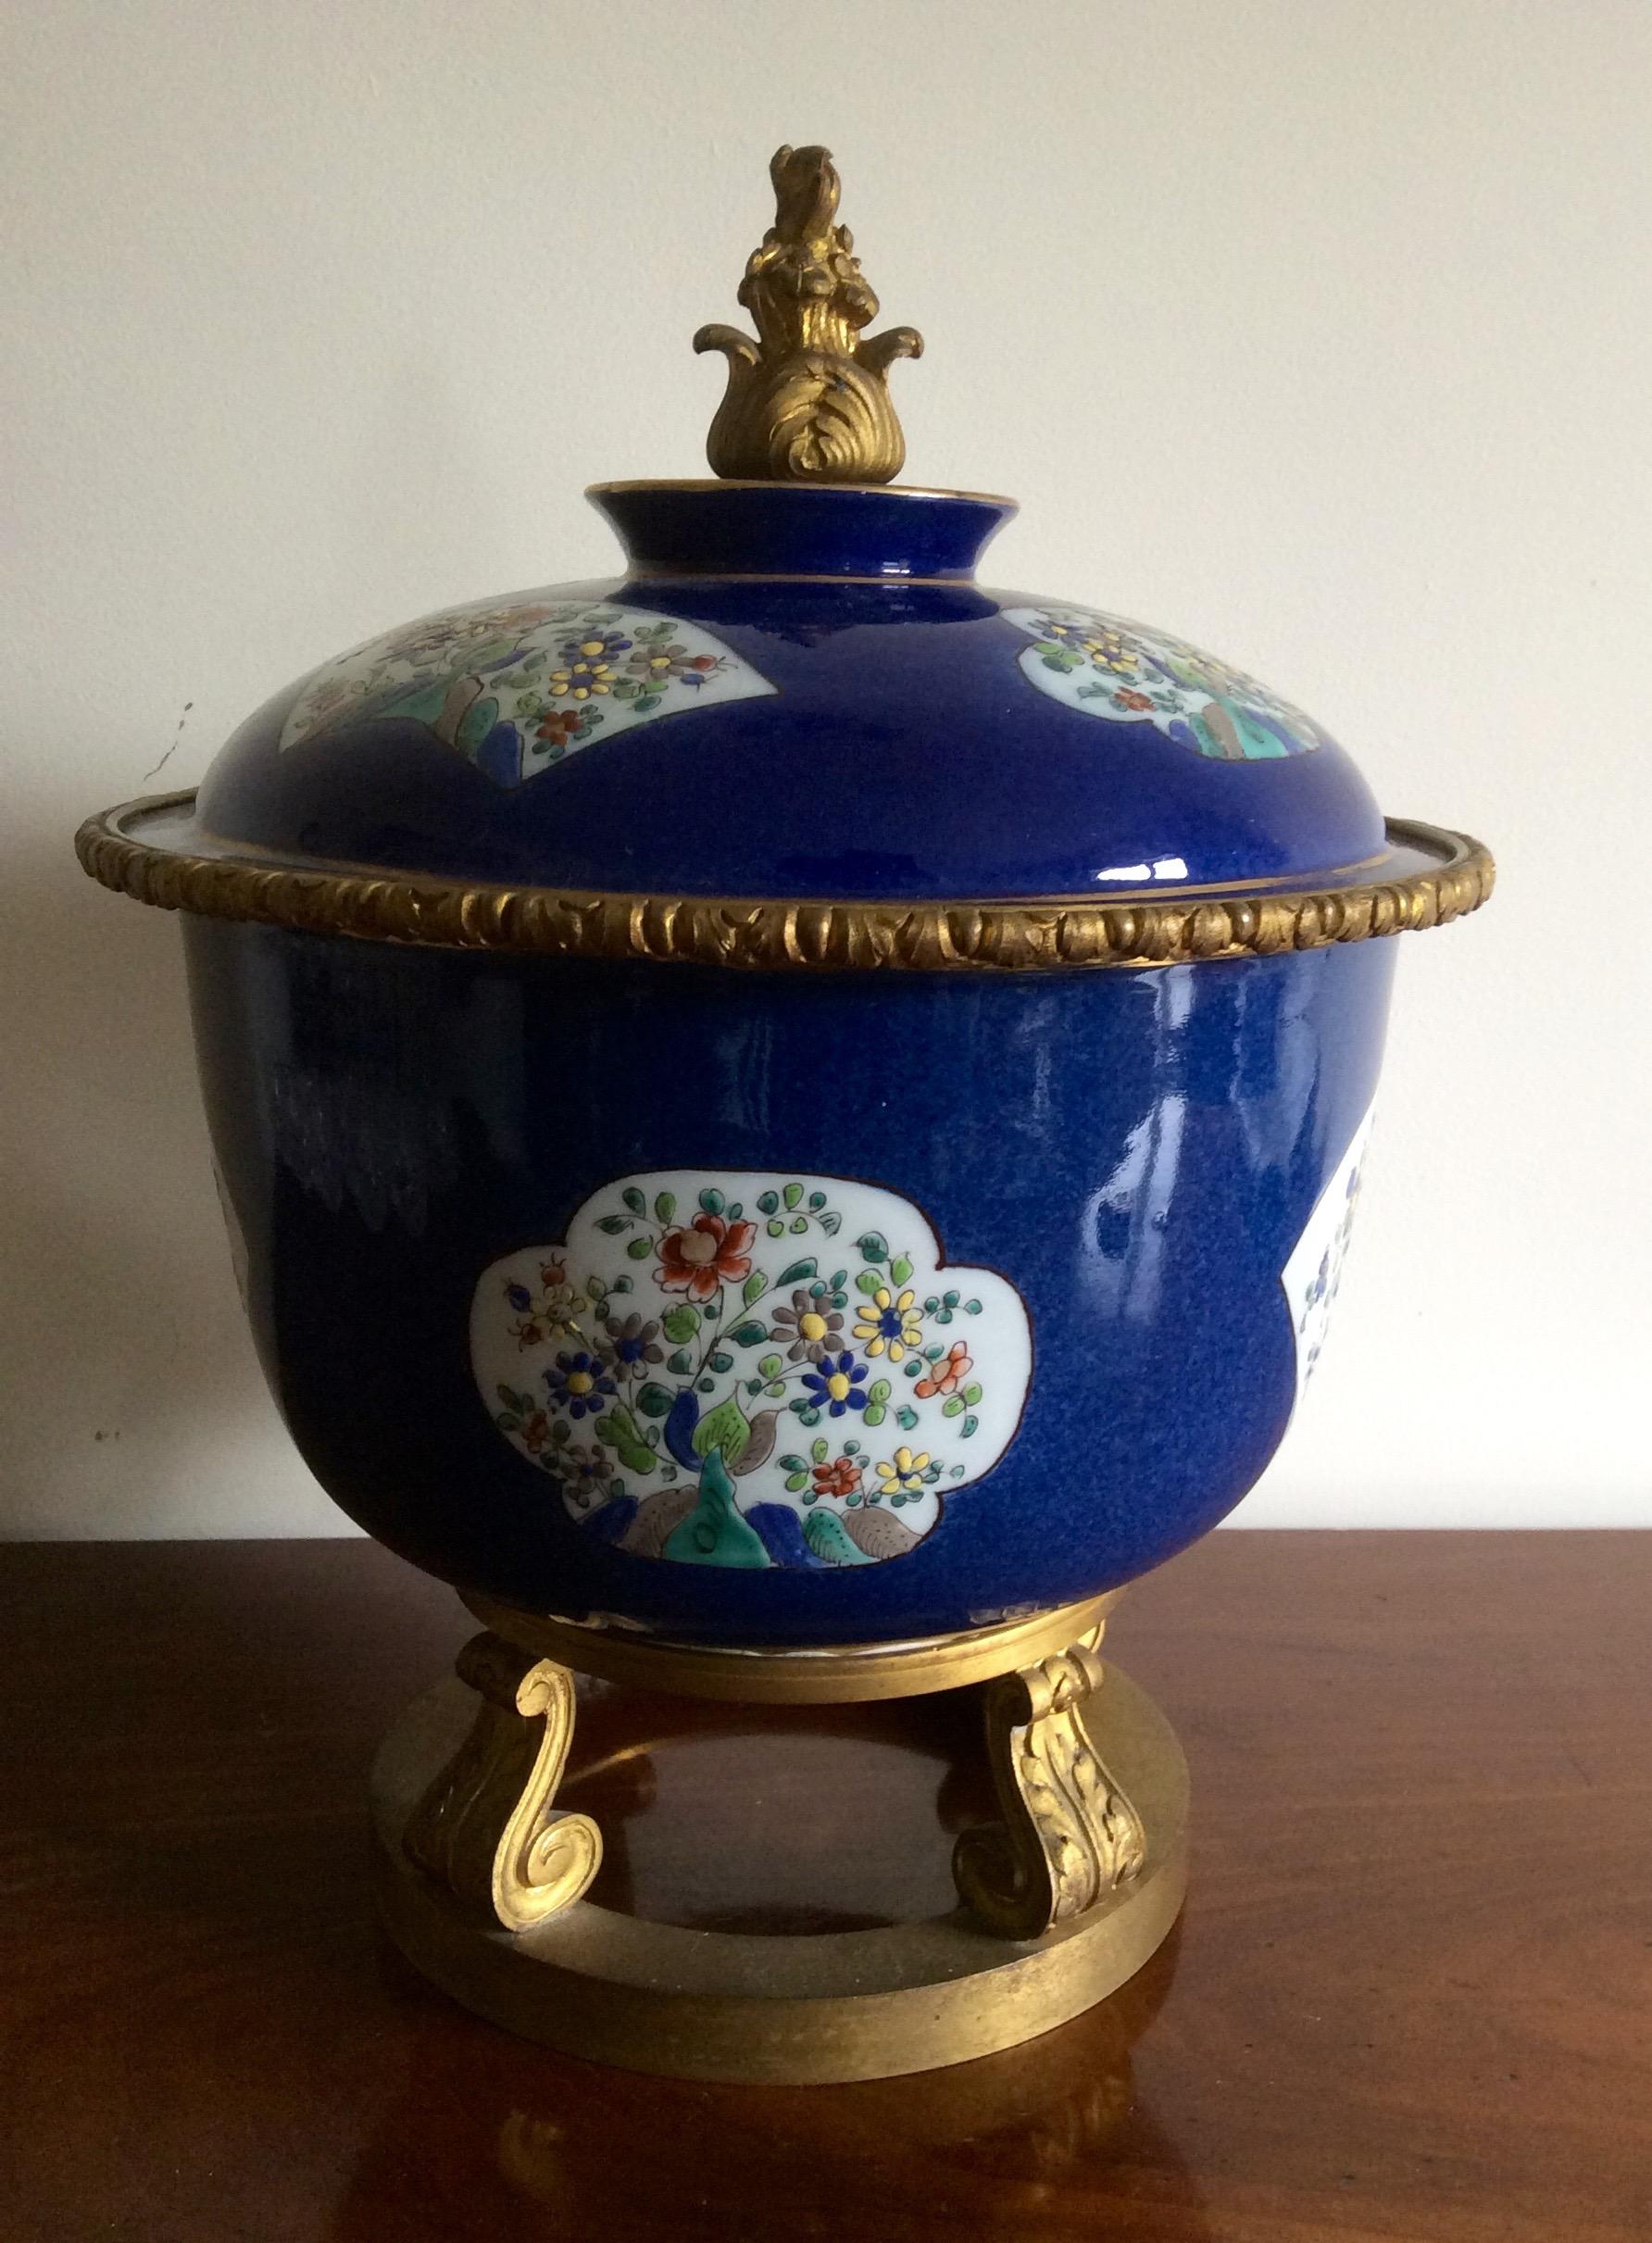 Lot 22 - Powder blue porcelain bowl with enamel panels and gilt mounts